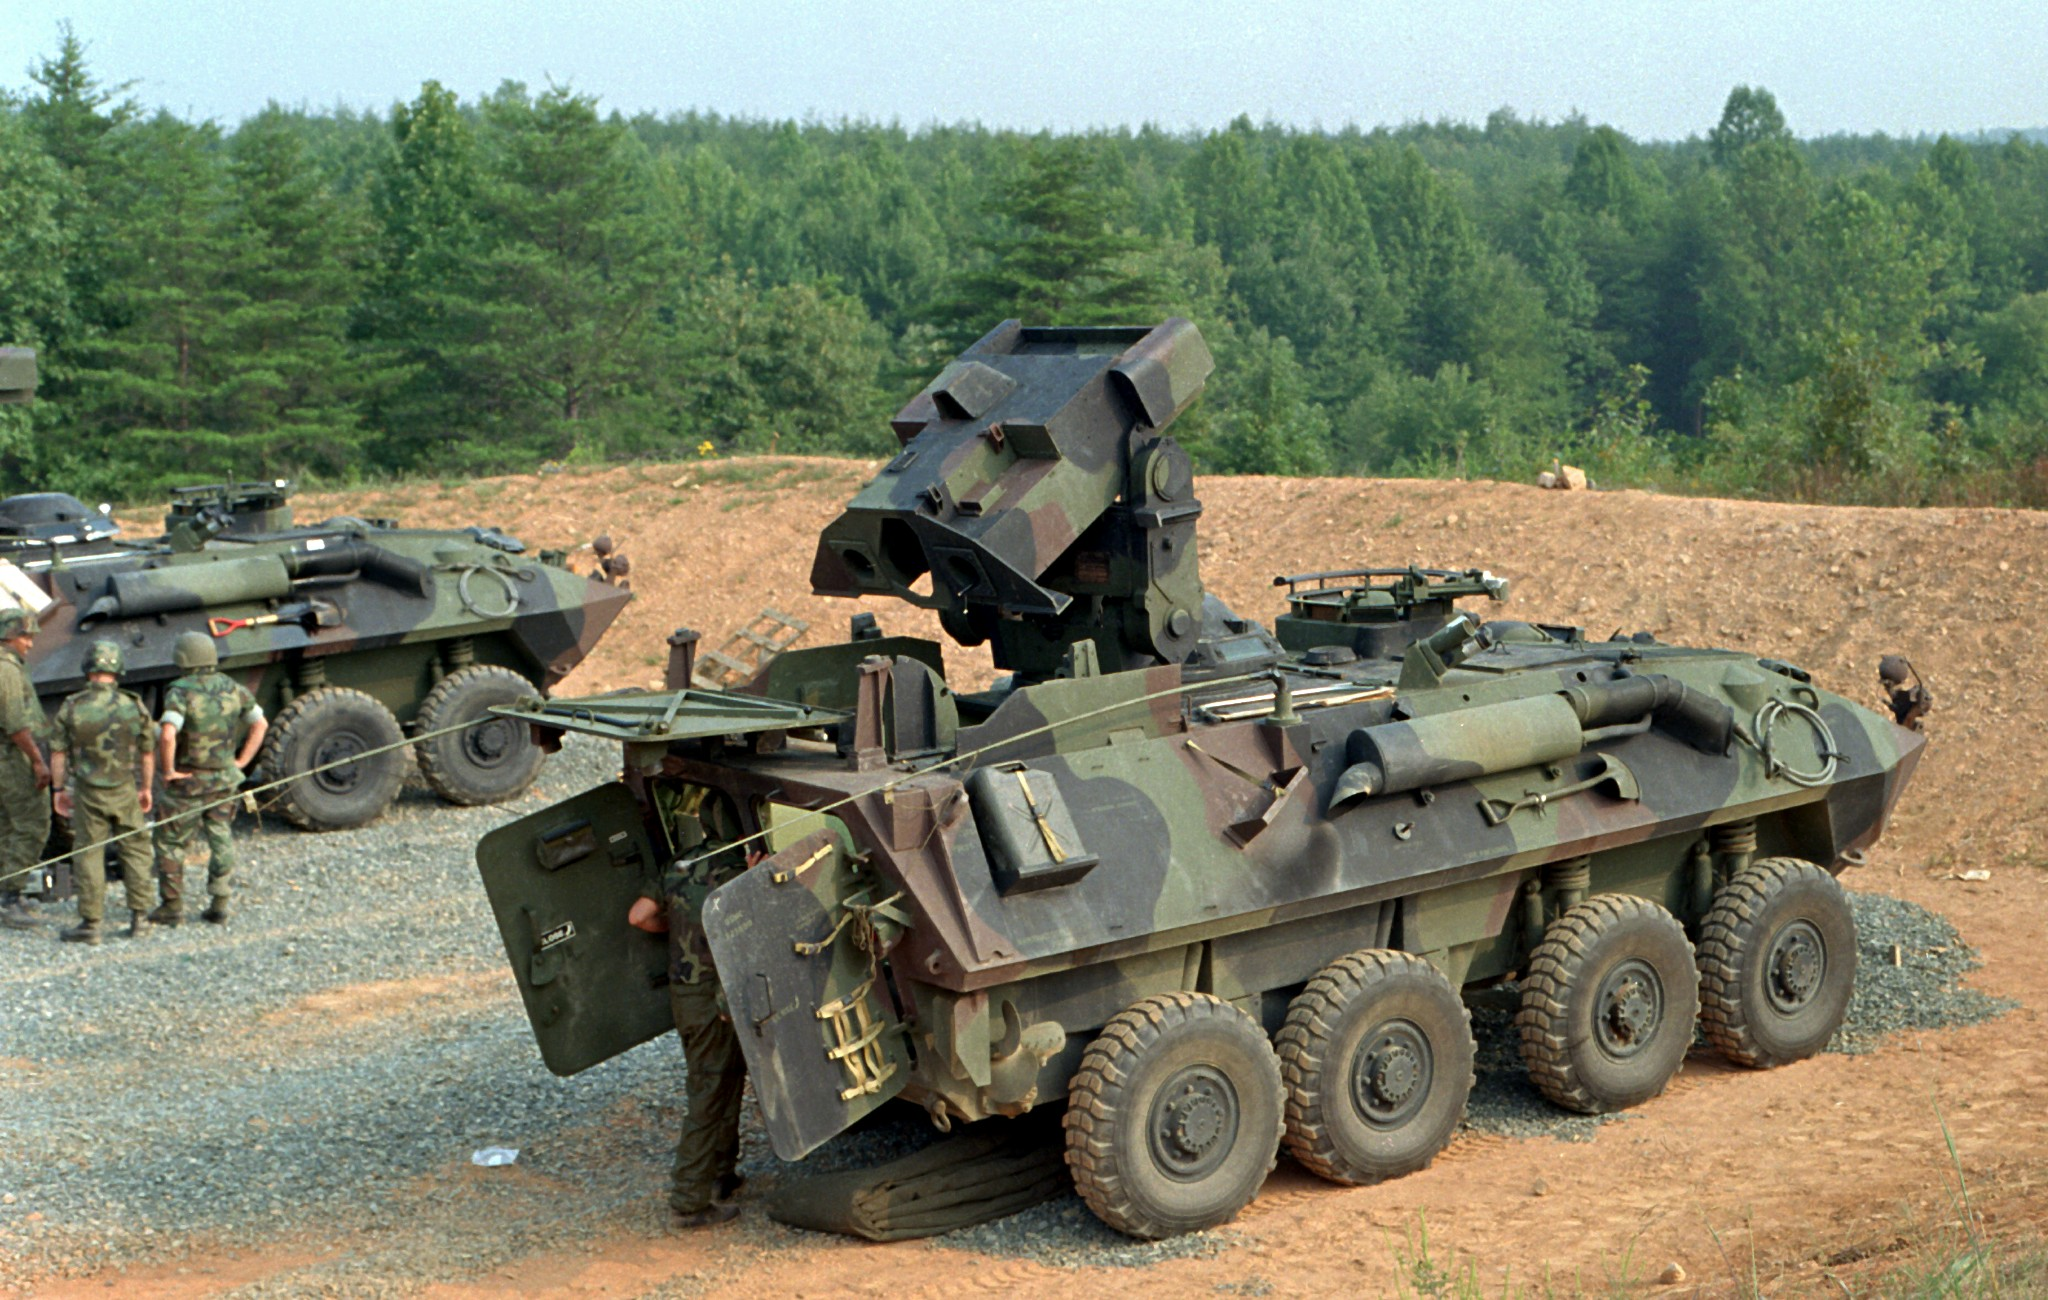 Light Armored Vehicle 25 (LAV-25)